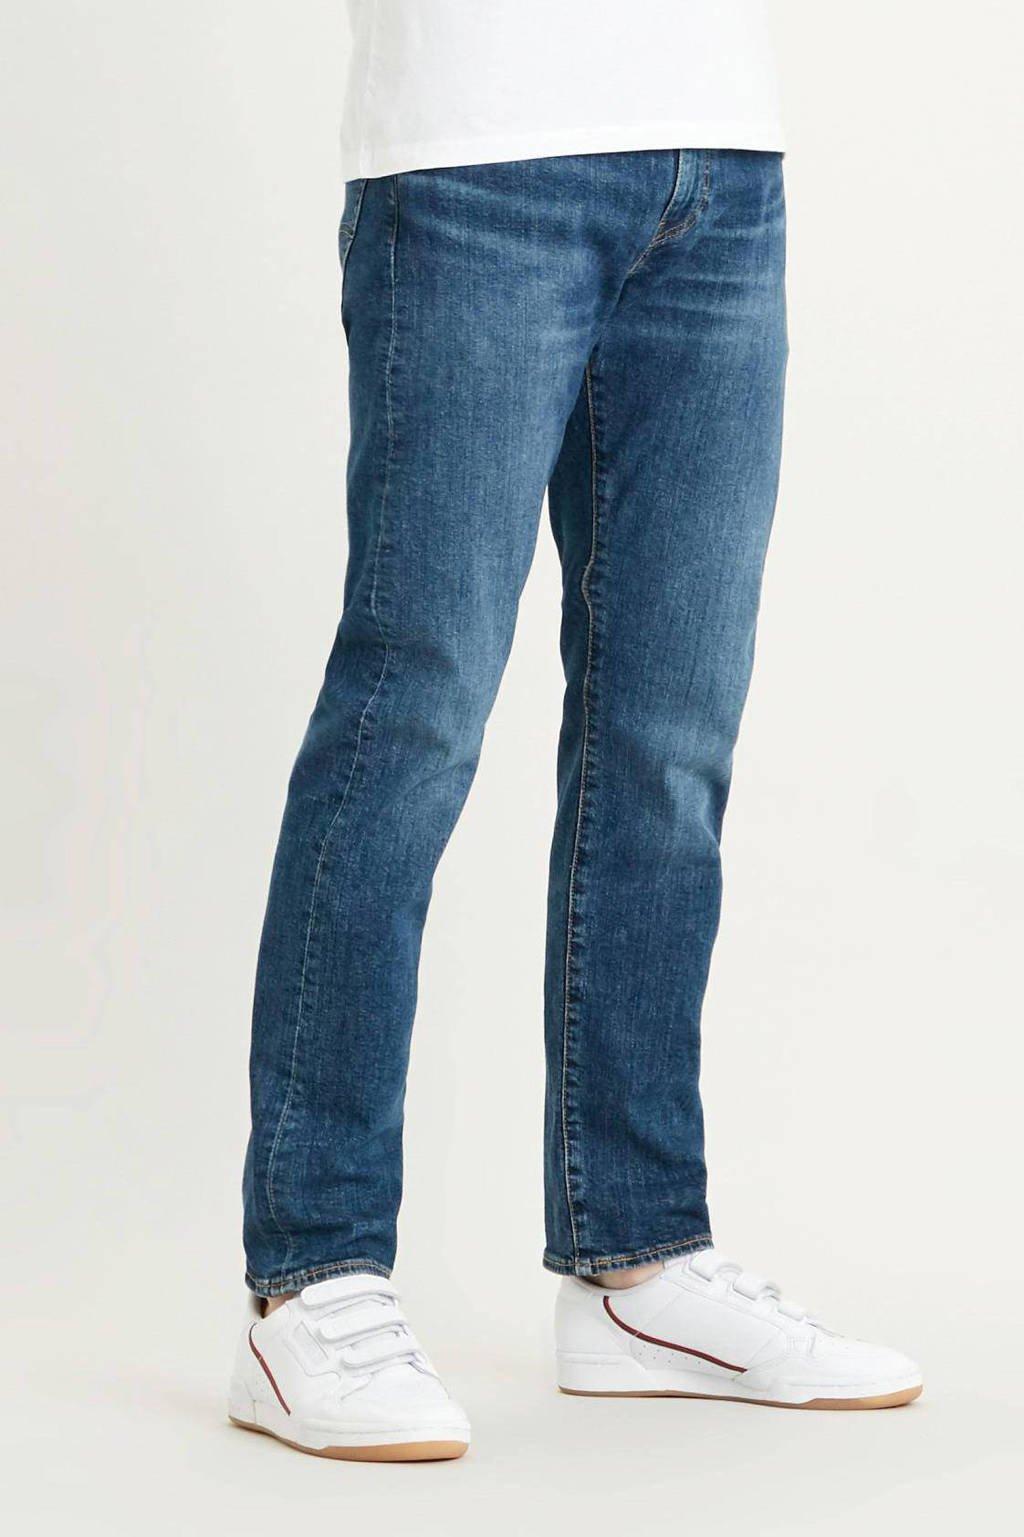 Levi's 502 tapered fit jeans wagyu moss, Wagyu Moss